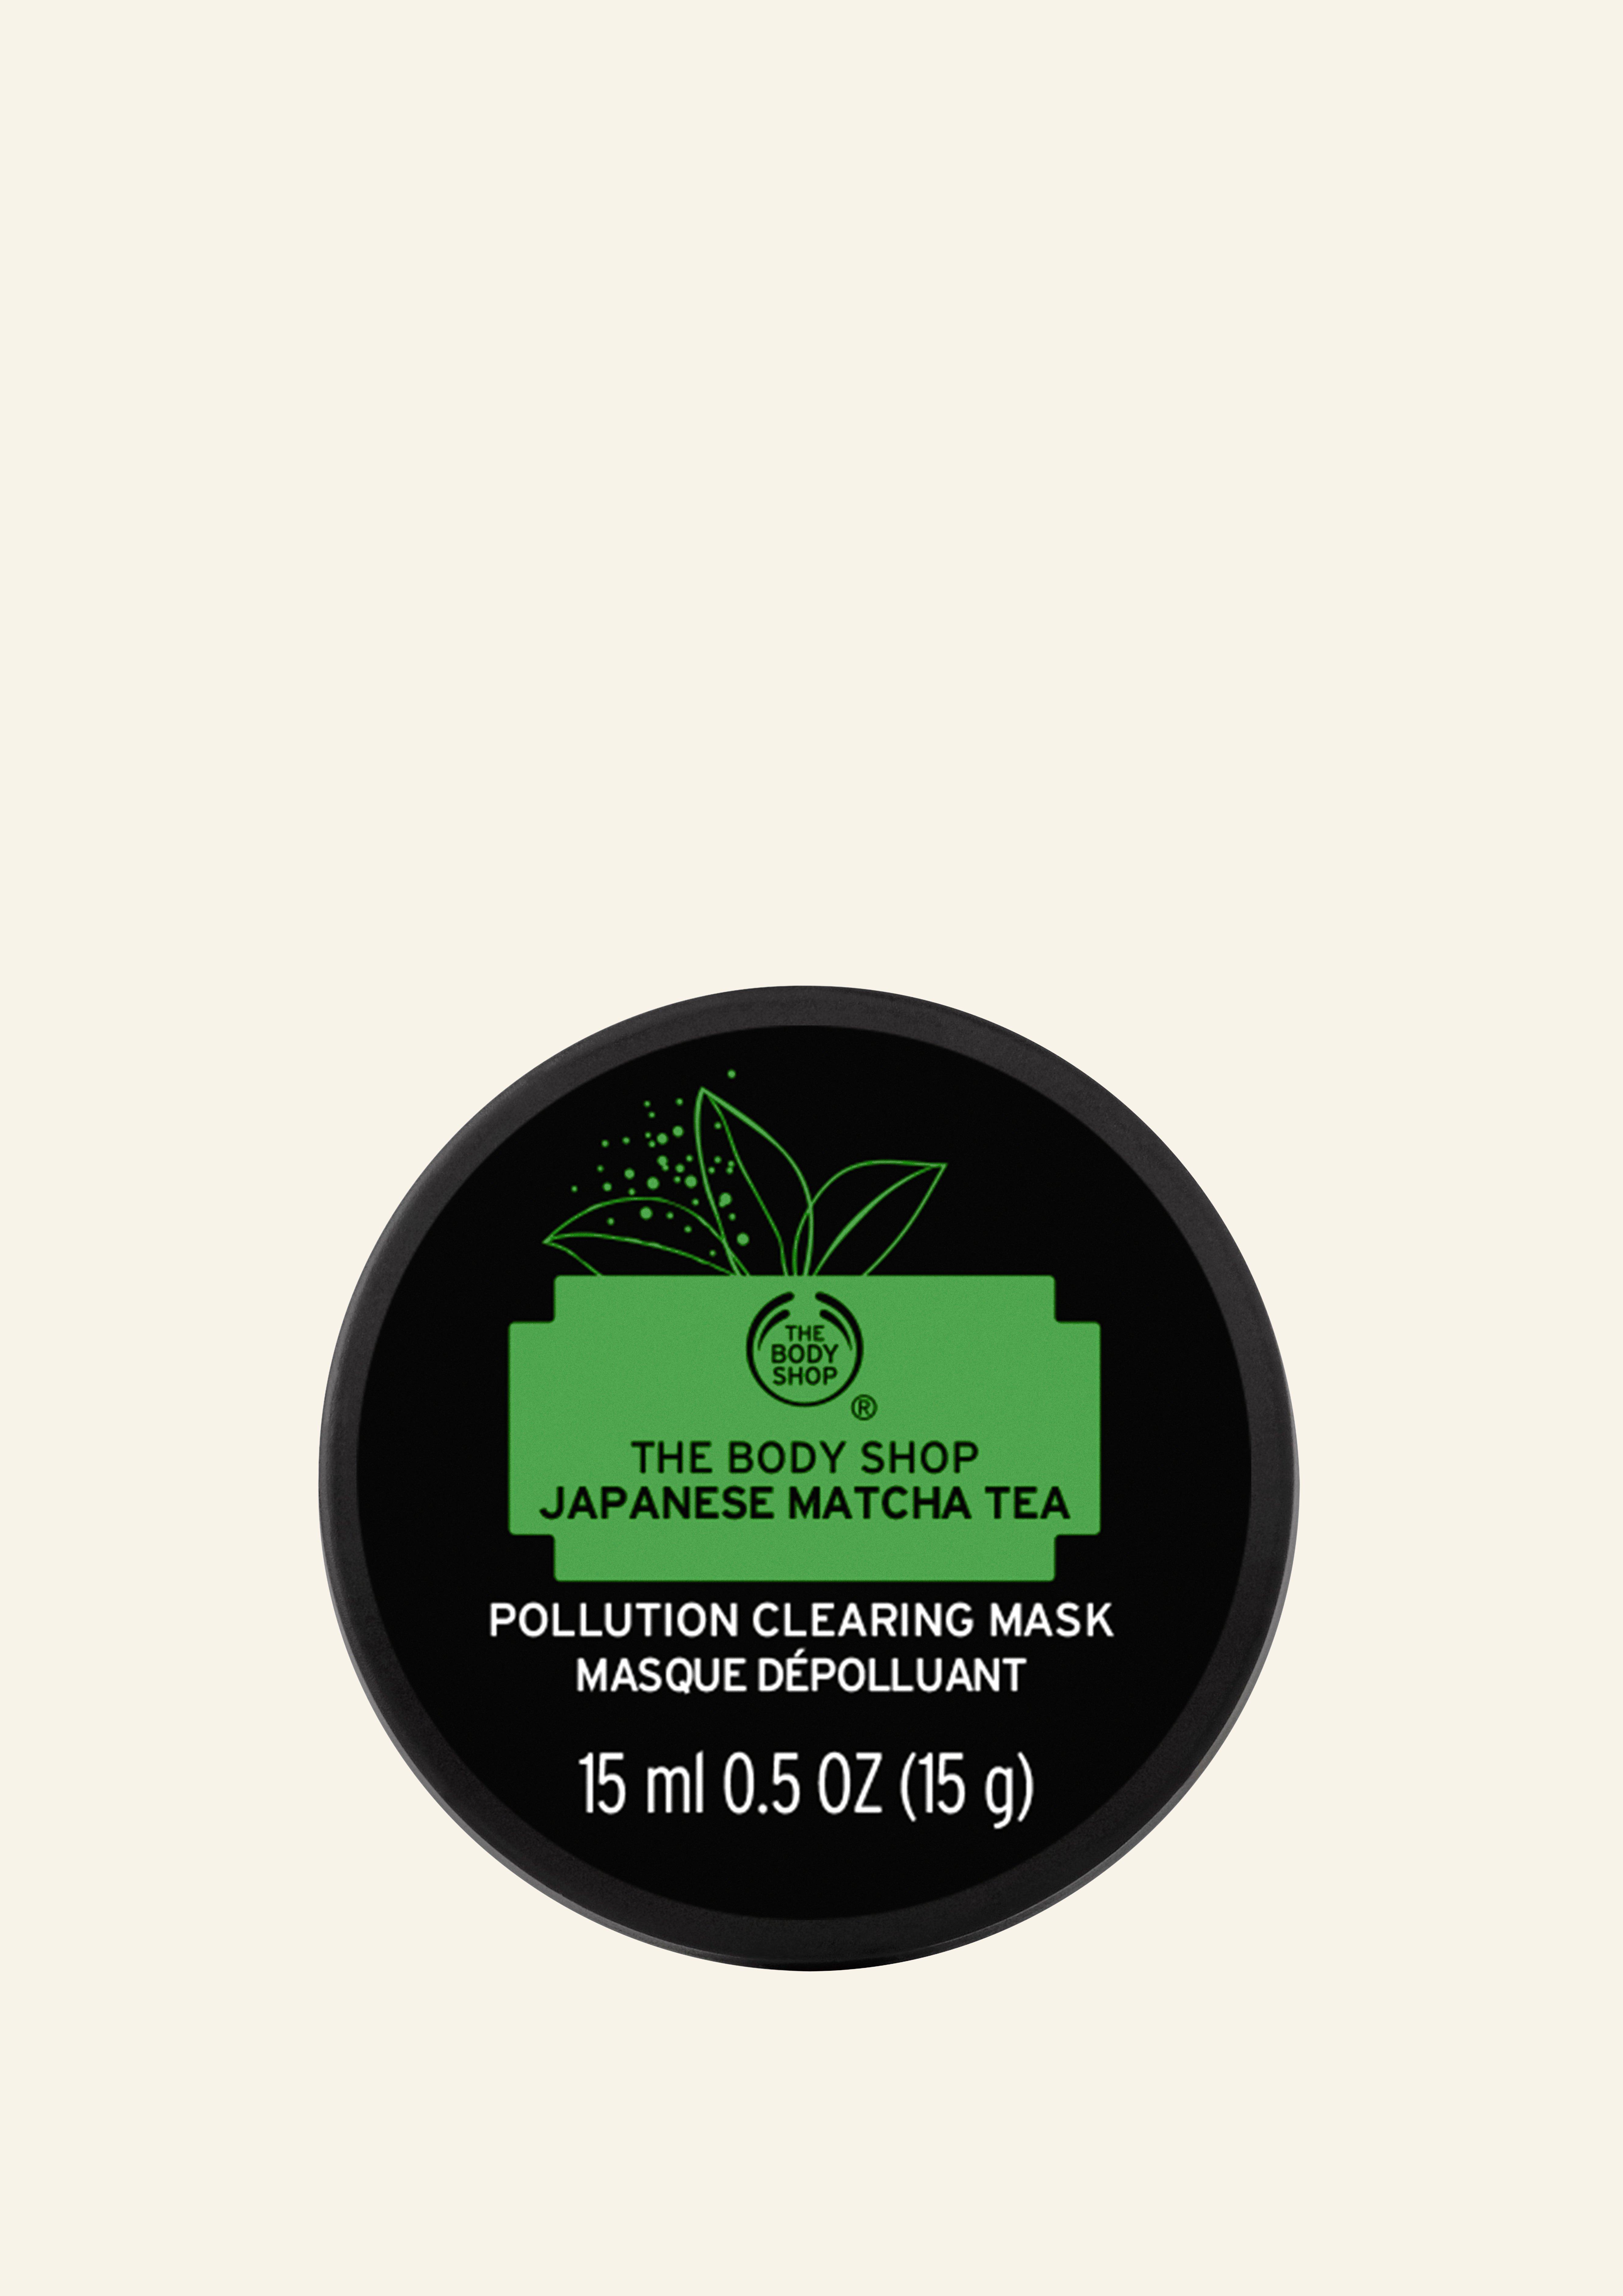 Maskë Pastruese kundër Ndotjes Japanese Matcha Tea